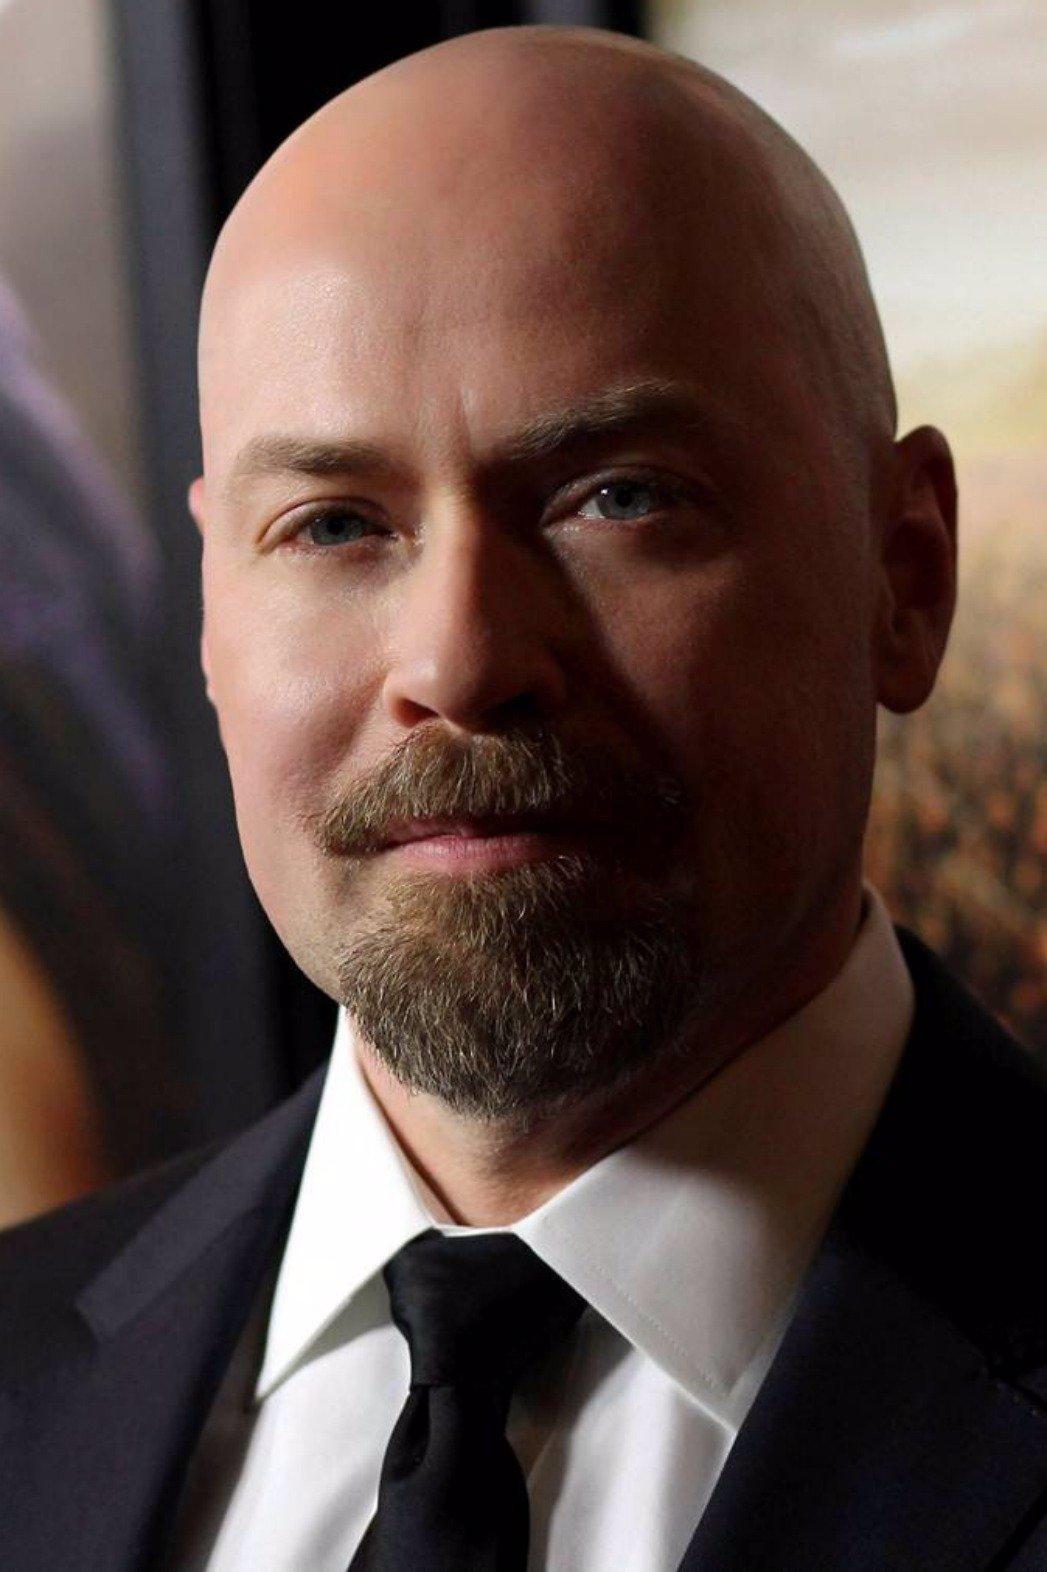 Nuevo showrunner para Daredevil, nueva serie de Netflix